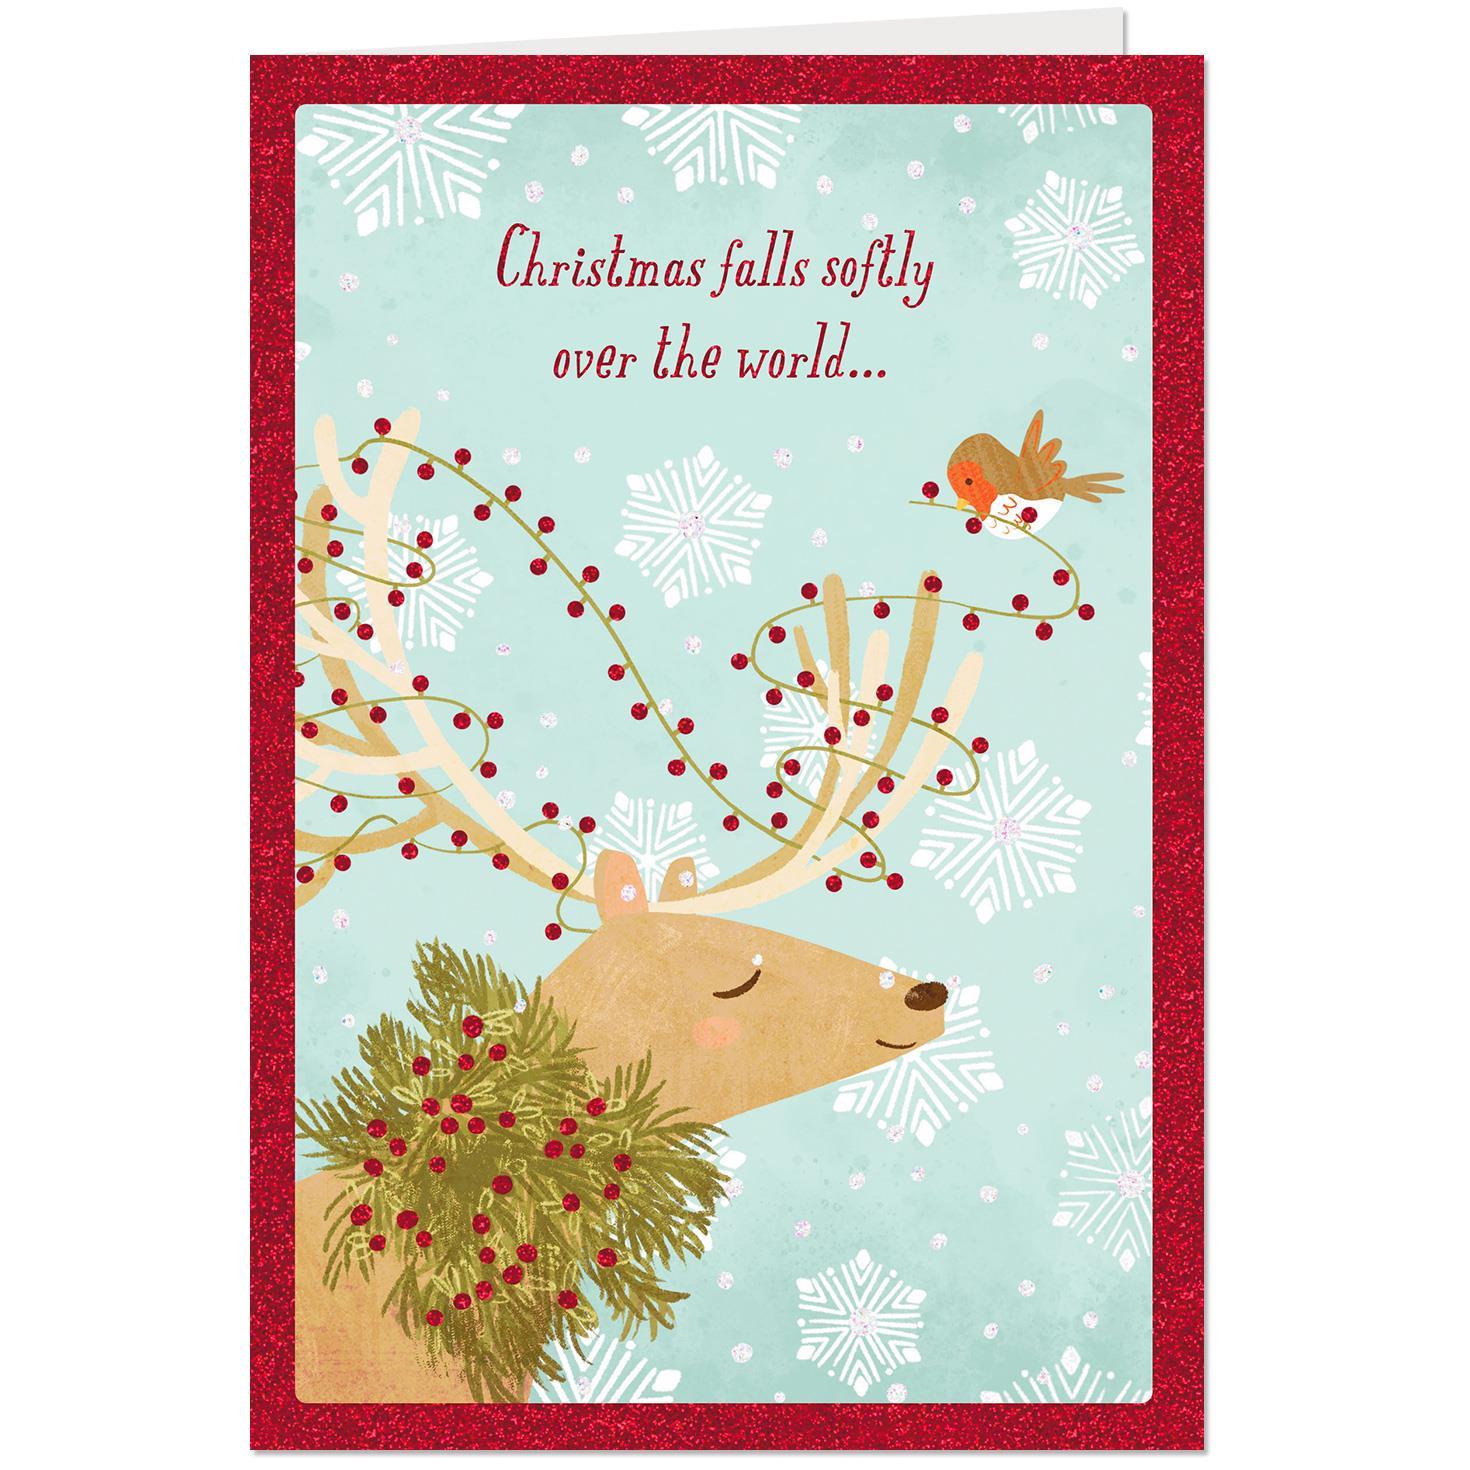 UNICEF Reindeer And Falling Snowflakes Christmas Card